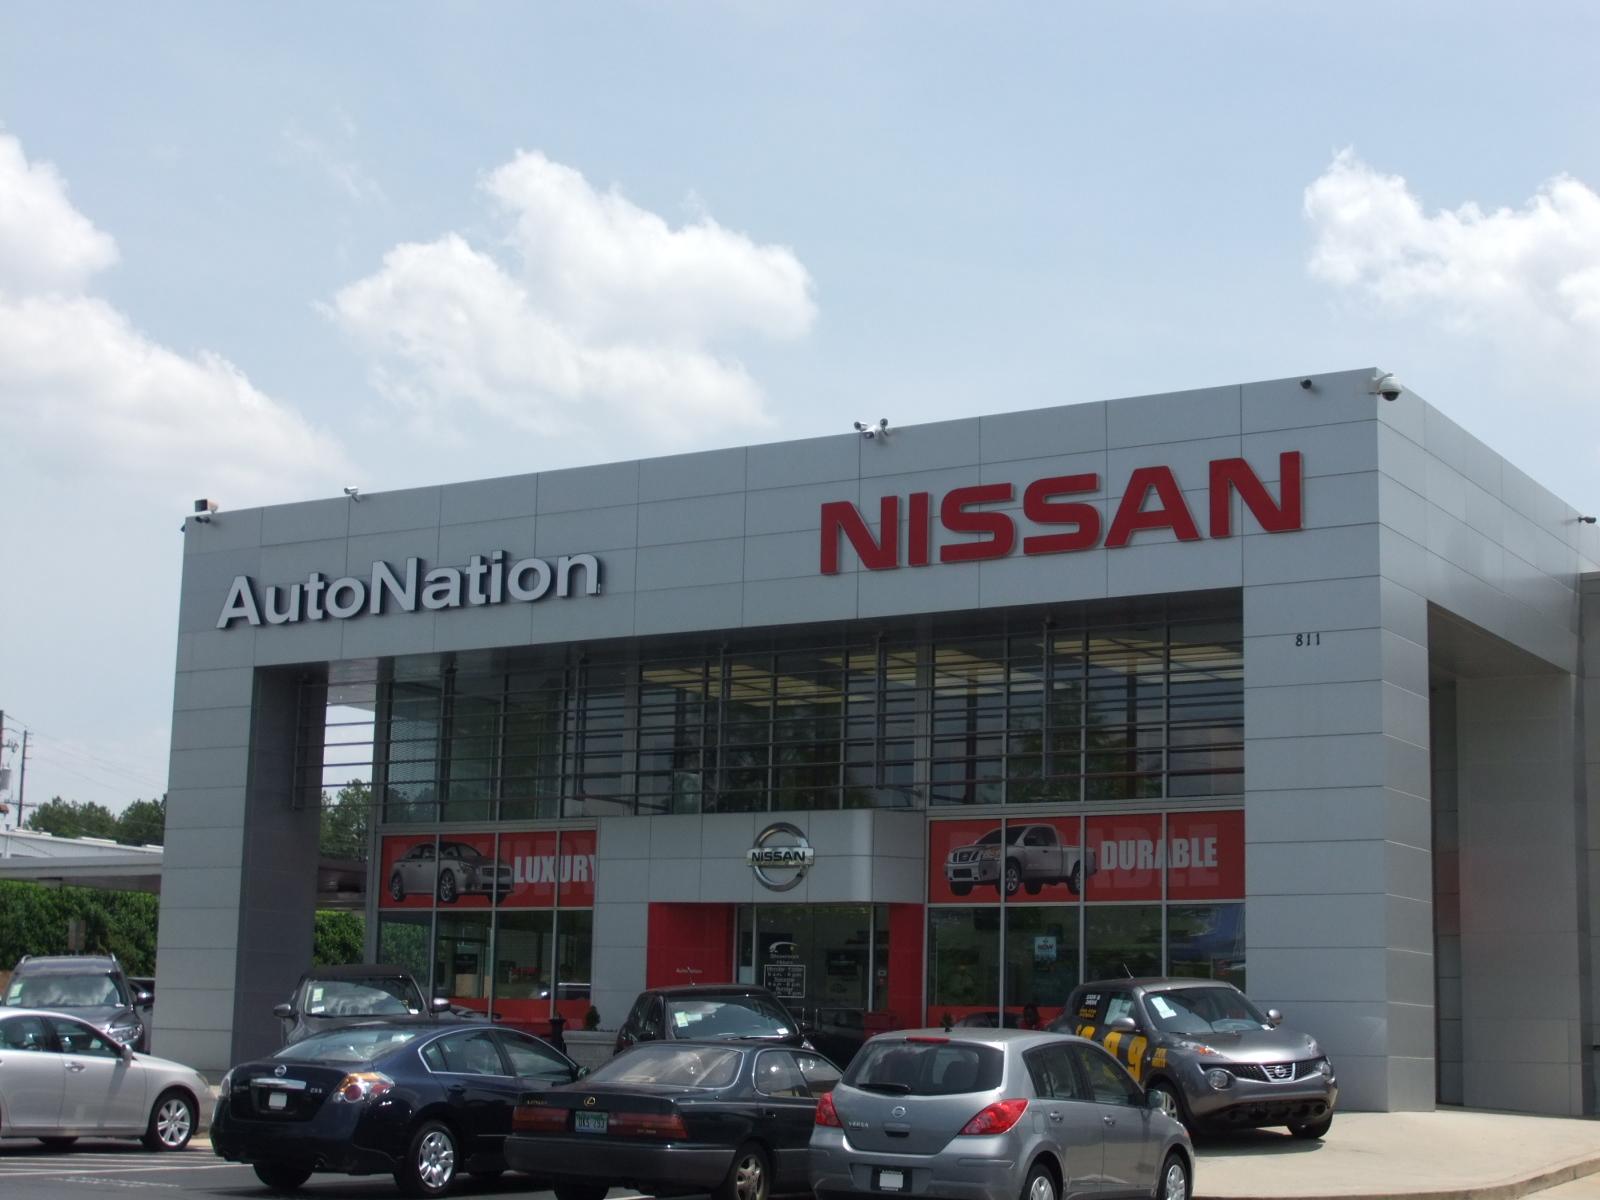 Honda Dealership Thornton Road >> AutoNation Nissan Thornton Road, Lithia Springs Georgia (GA) - LocalDatabase.com